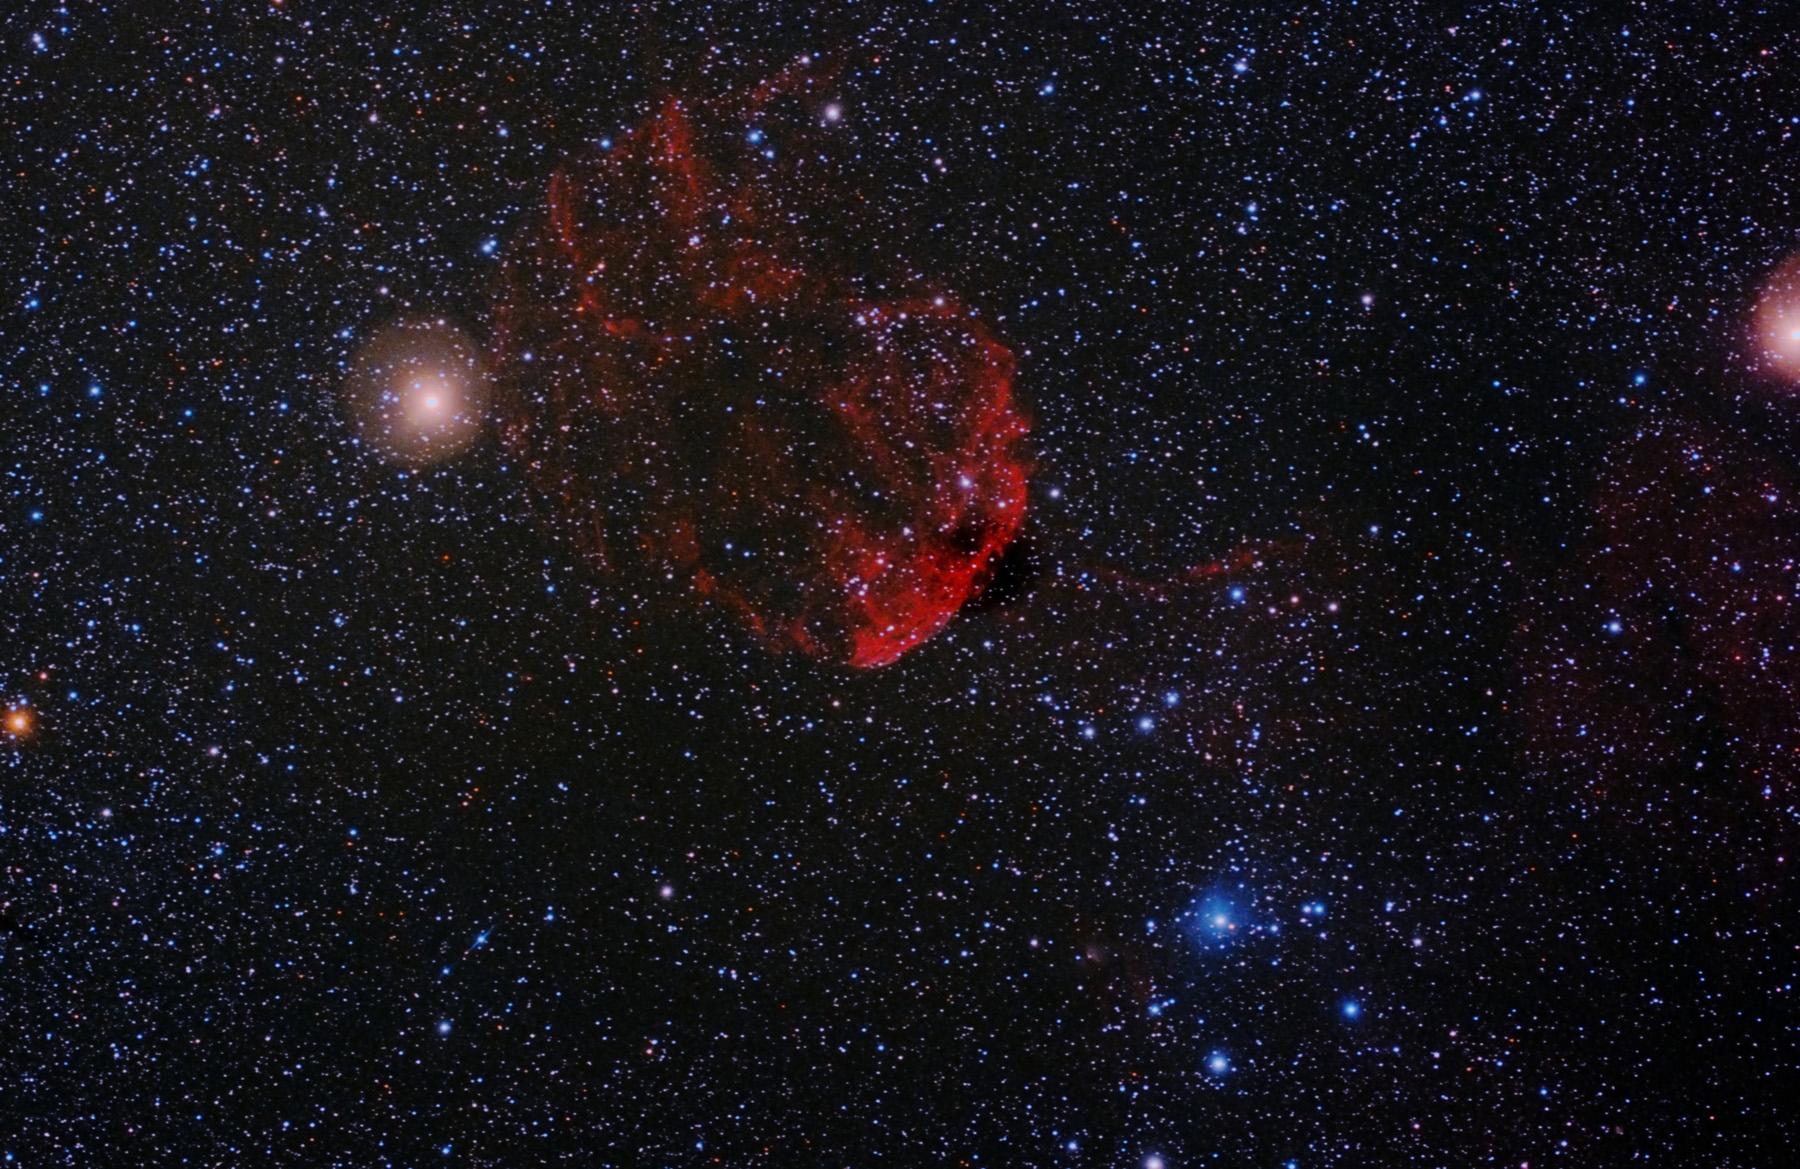 Nebulosa de la medusa IC 443